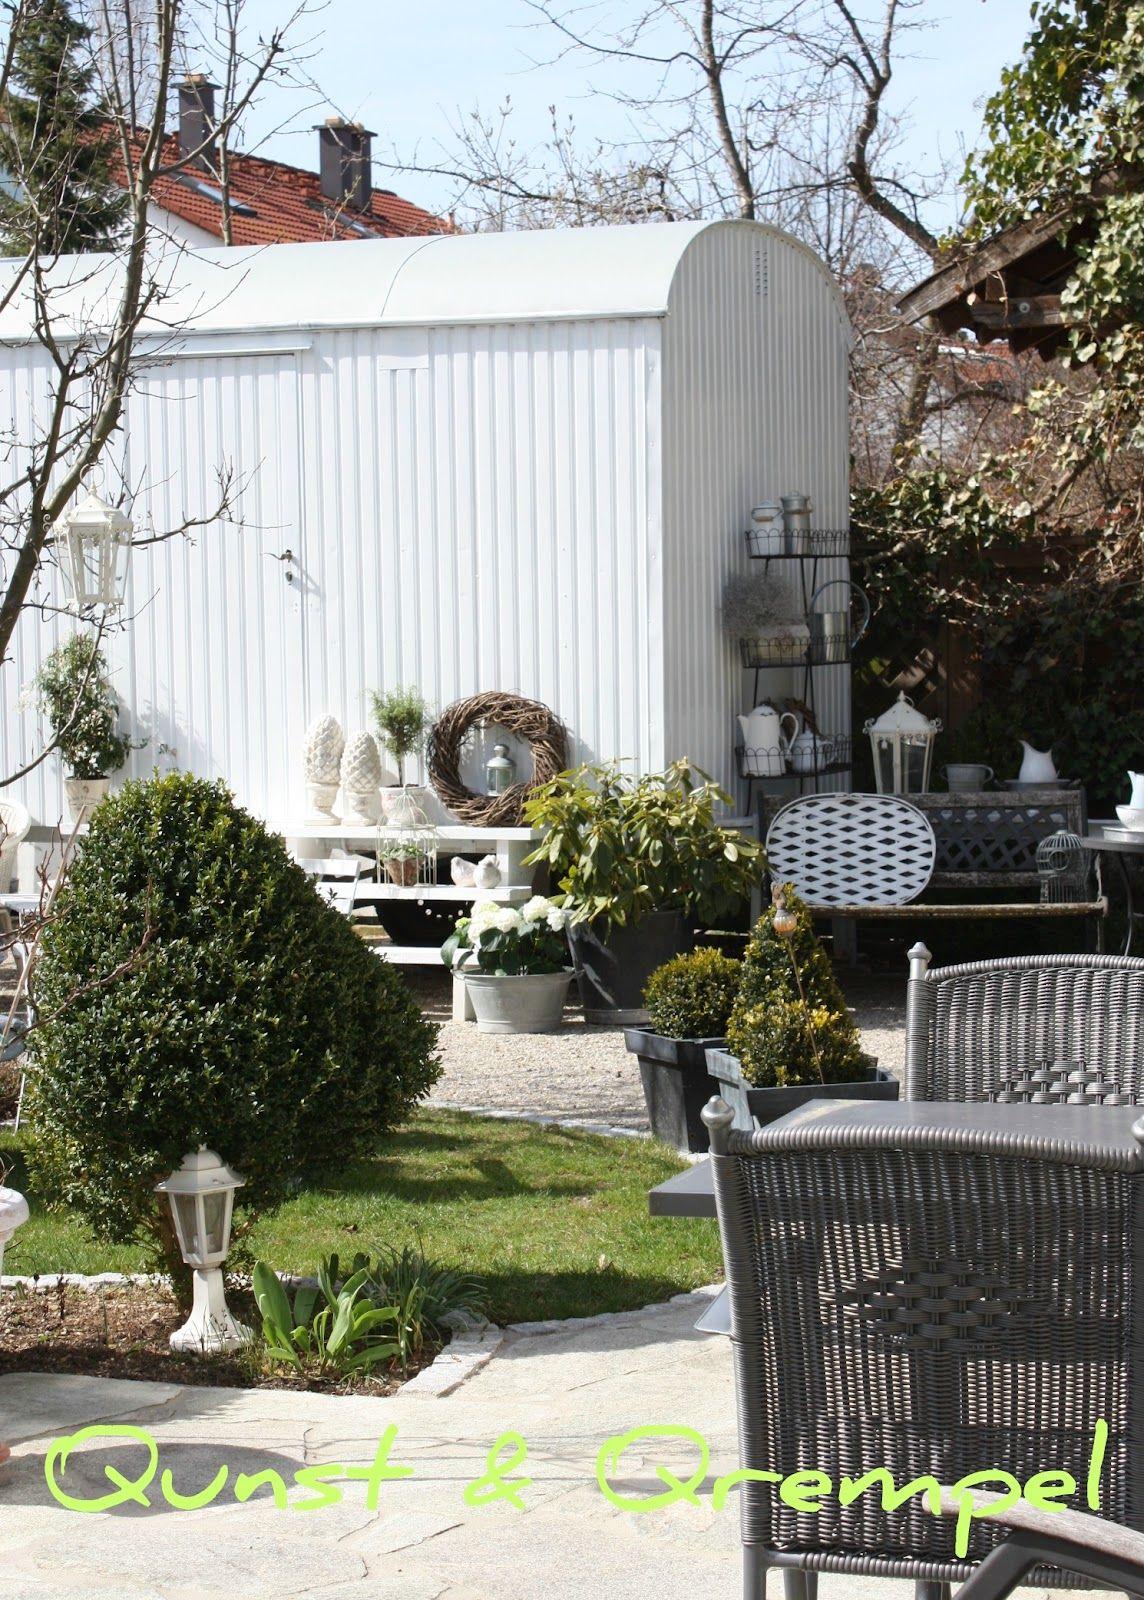 Qunst und qrempel bauwagen garten pinterest bauwagen bau und gartenhaus - Gartenhaus ausbauen ...